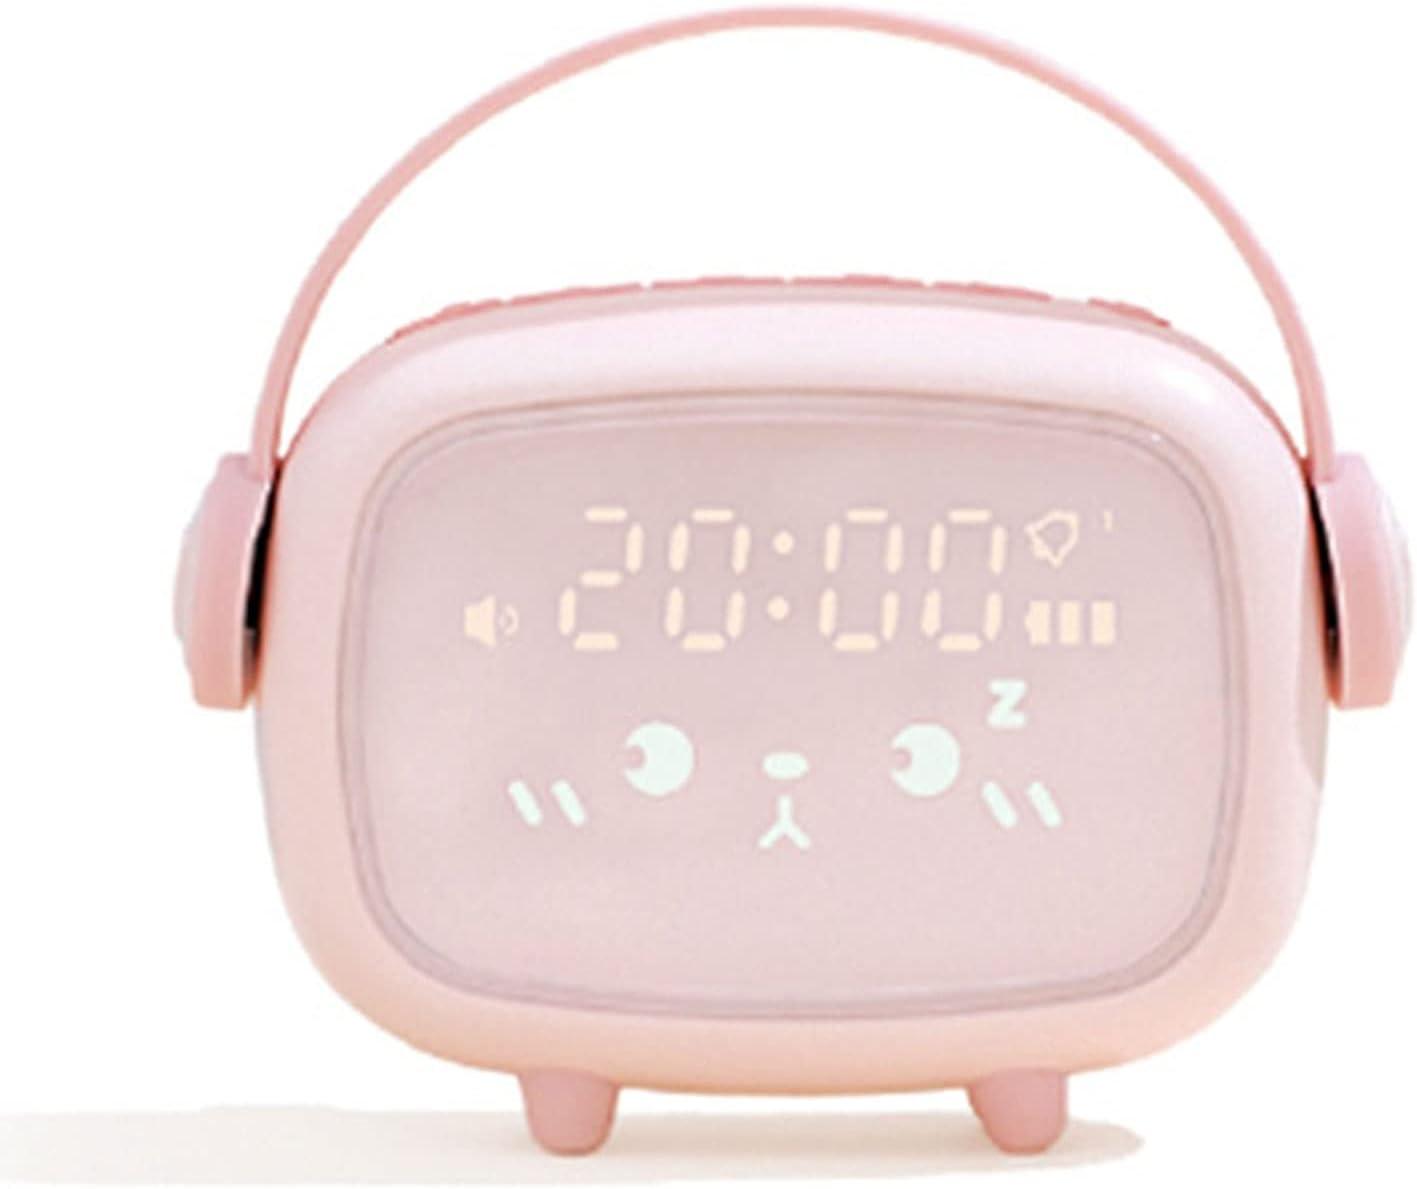 DUOWEI Brand new Creative Children's Music Electronic Under blast sales Mute Ala Clock Small